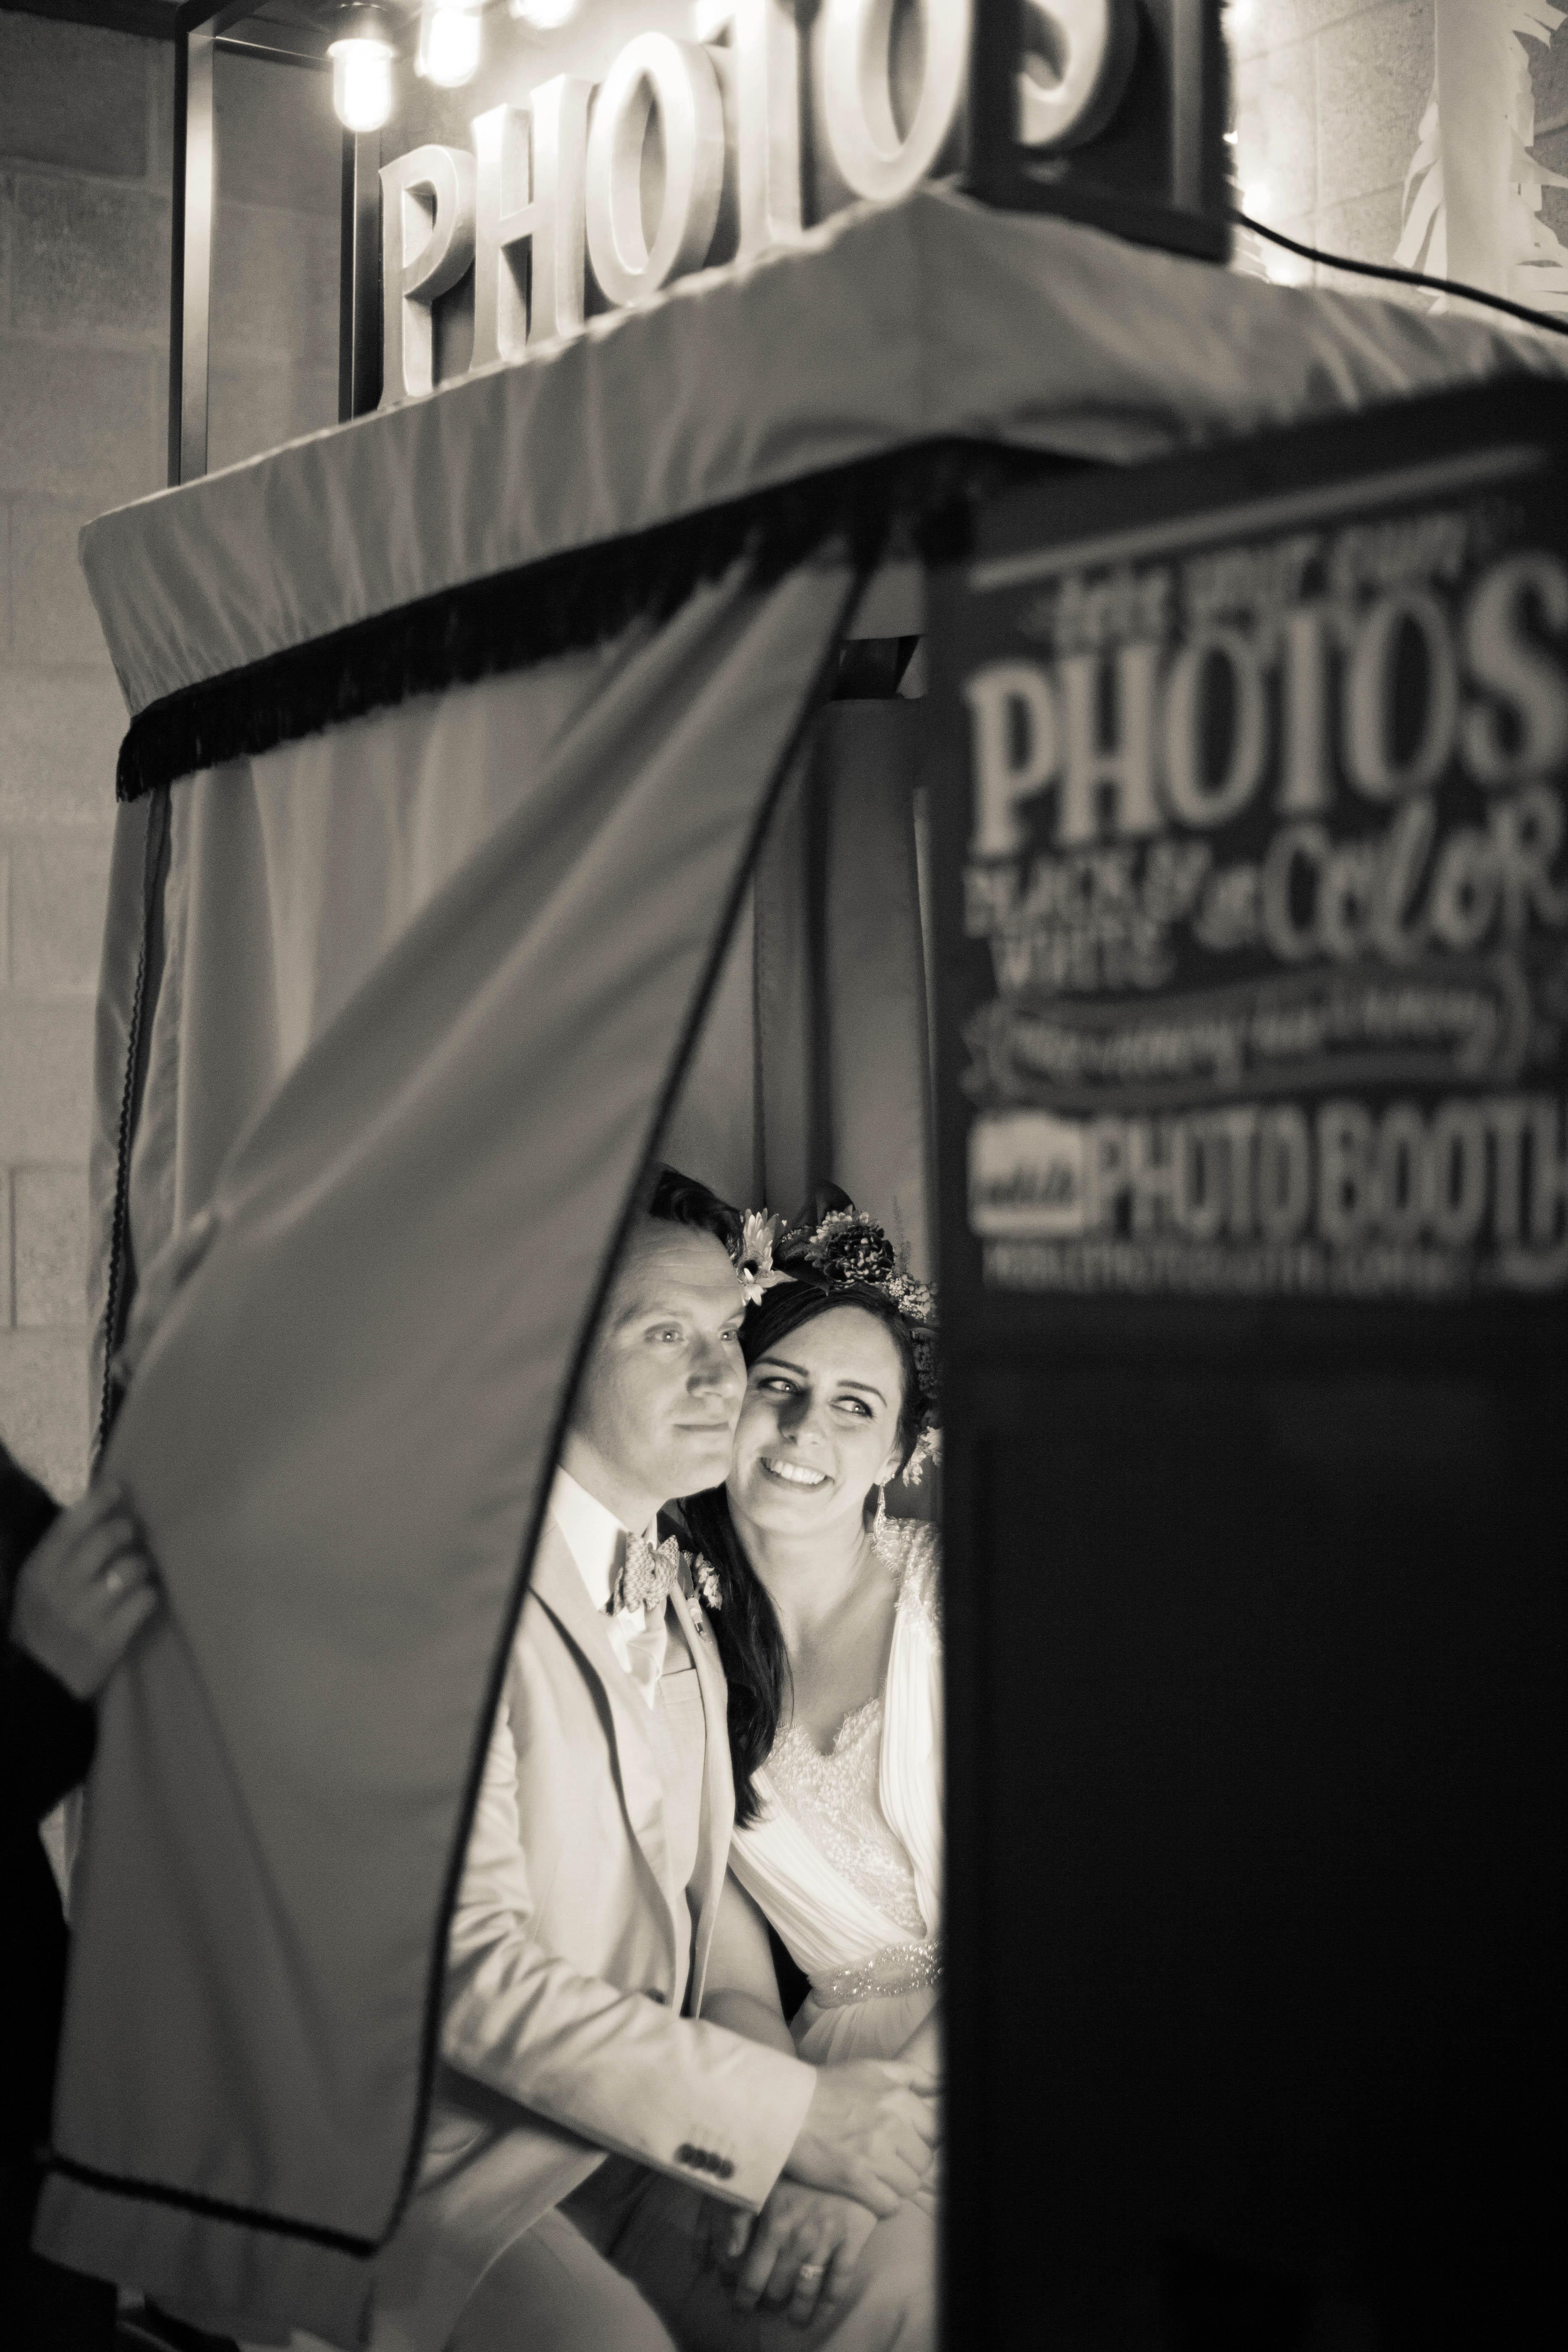 wedding games photo booth